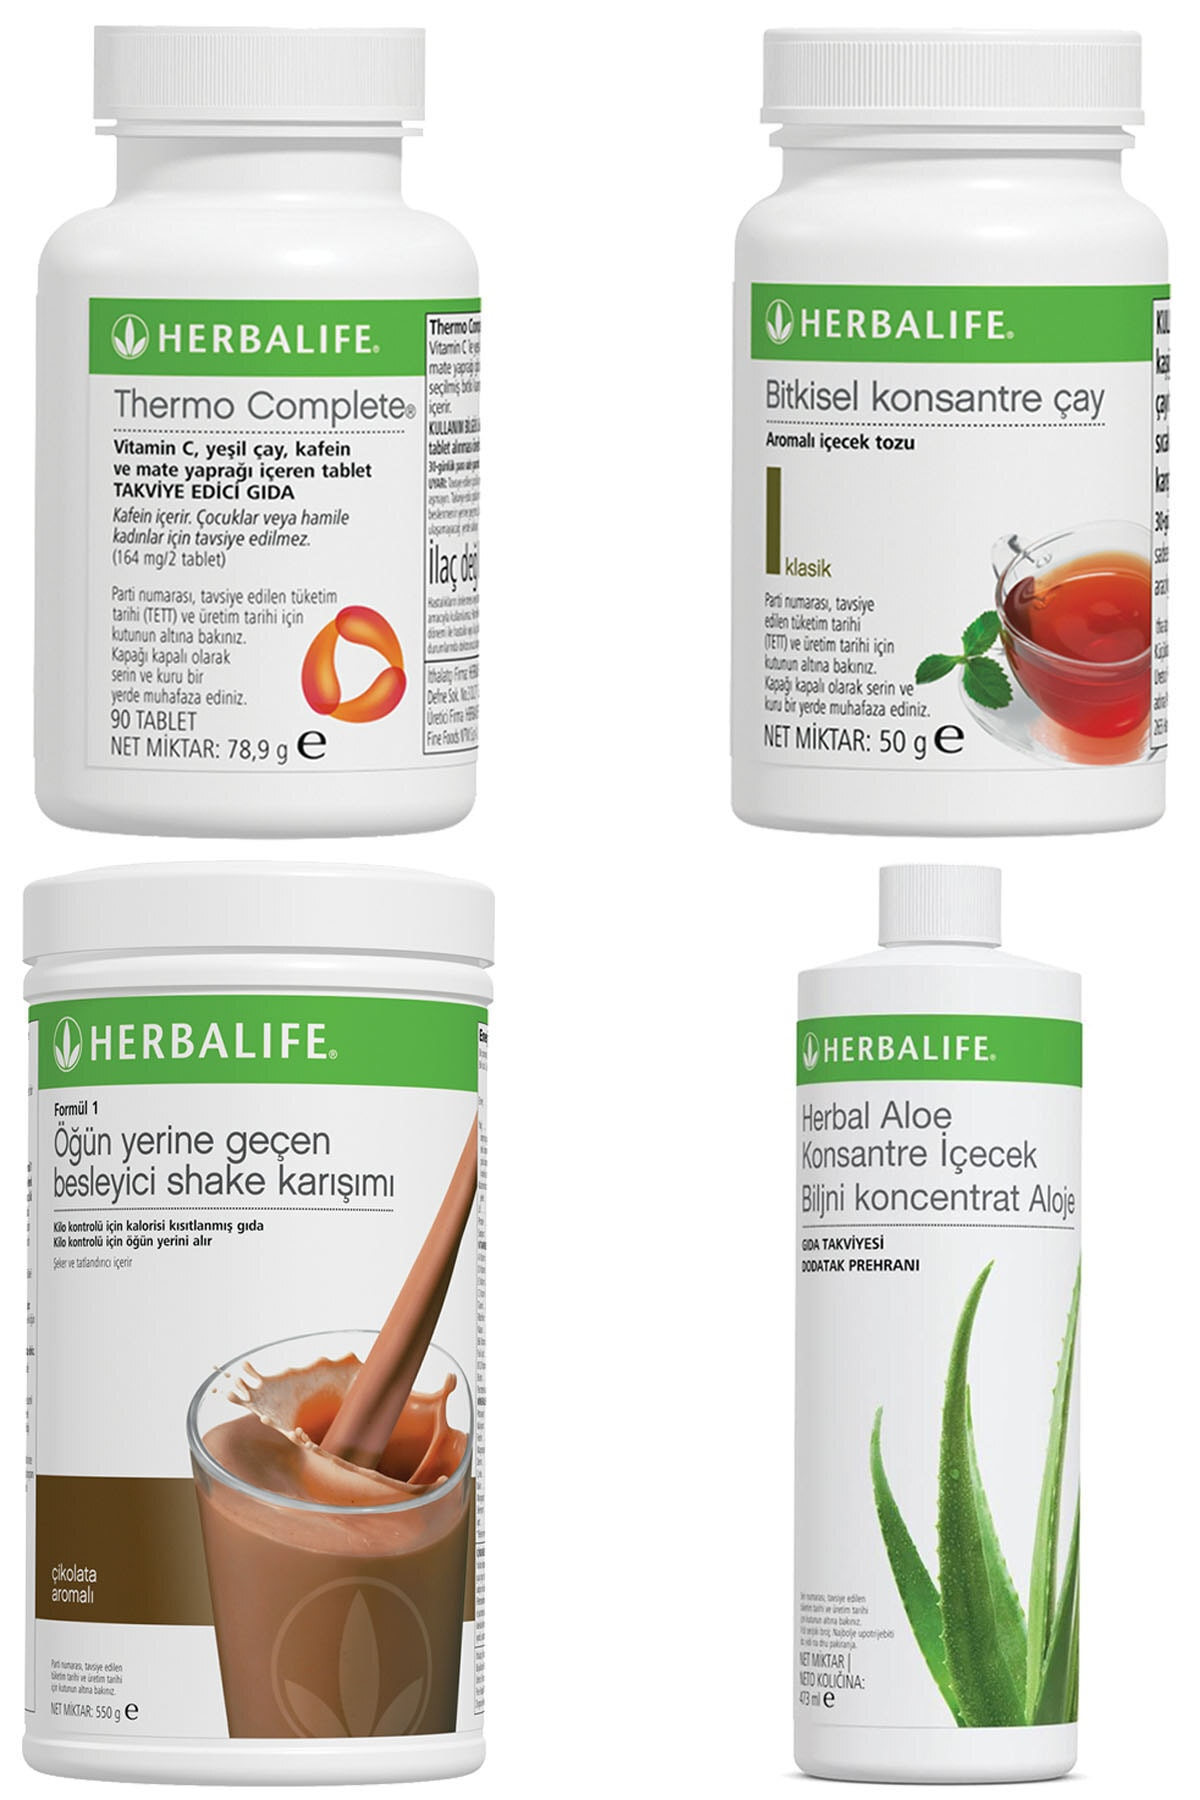 Herbalife Shake Çikolatalı, Thermo Complete, Aloe Vera Konsantre Içecek, Klasik Çay 50gr Birer Adet 1